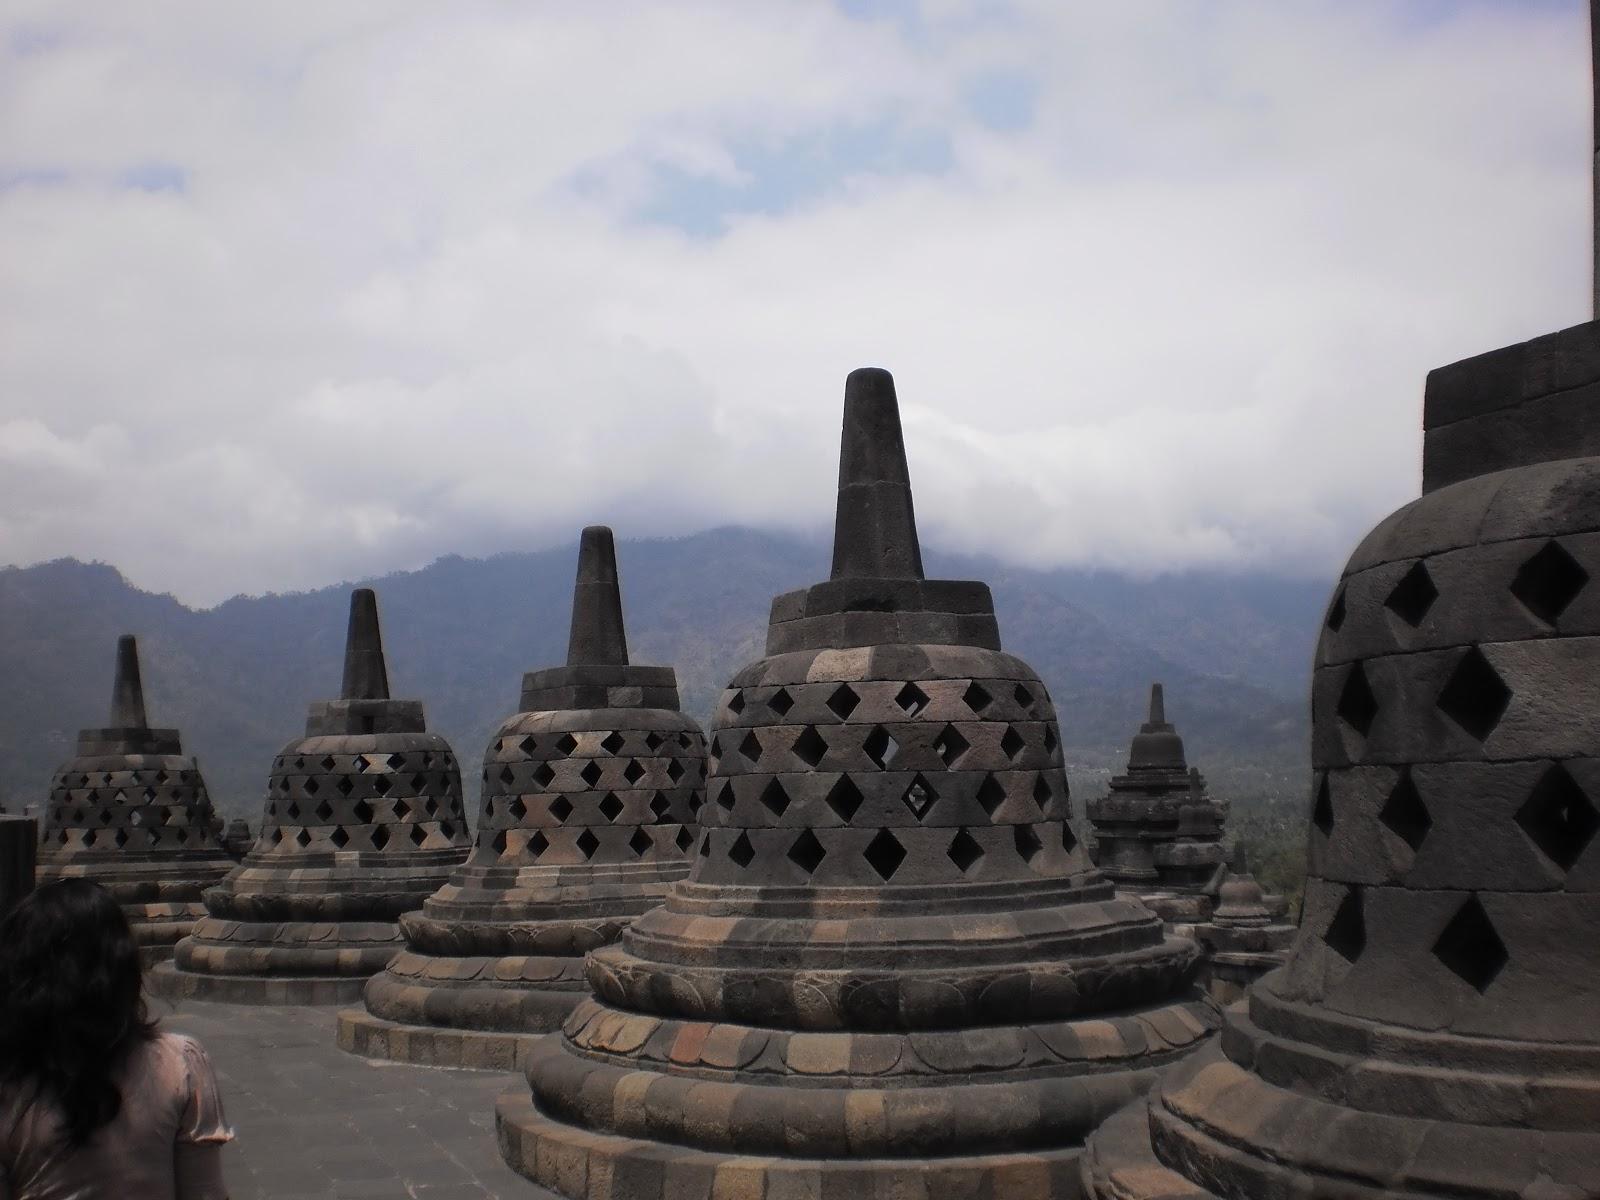 November 2012 World Setelah Selesai Muter2 Candi Borobudur Saatnya Gw